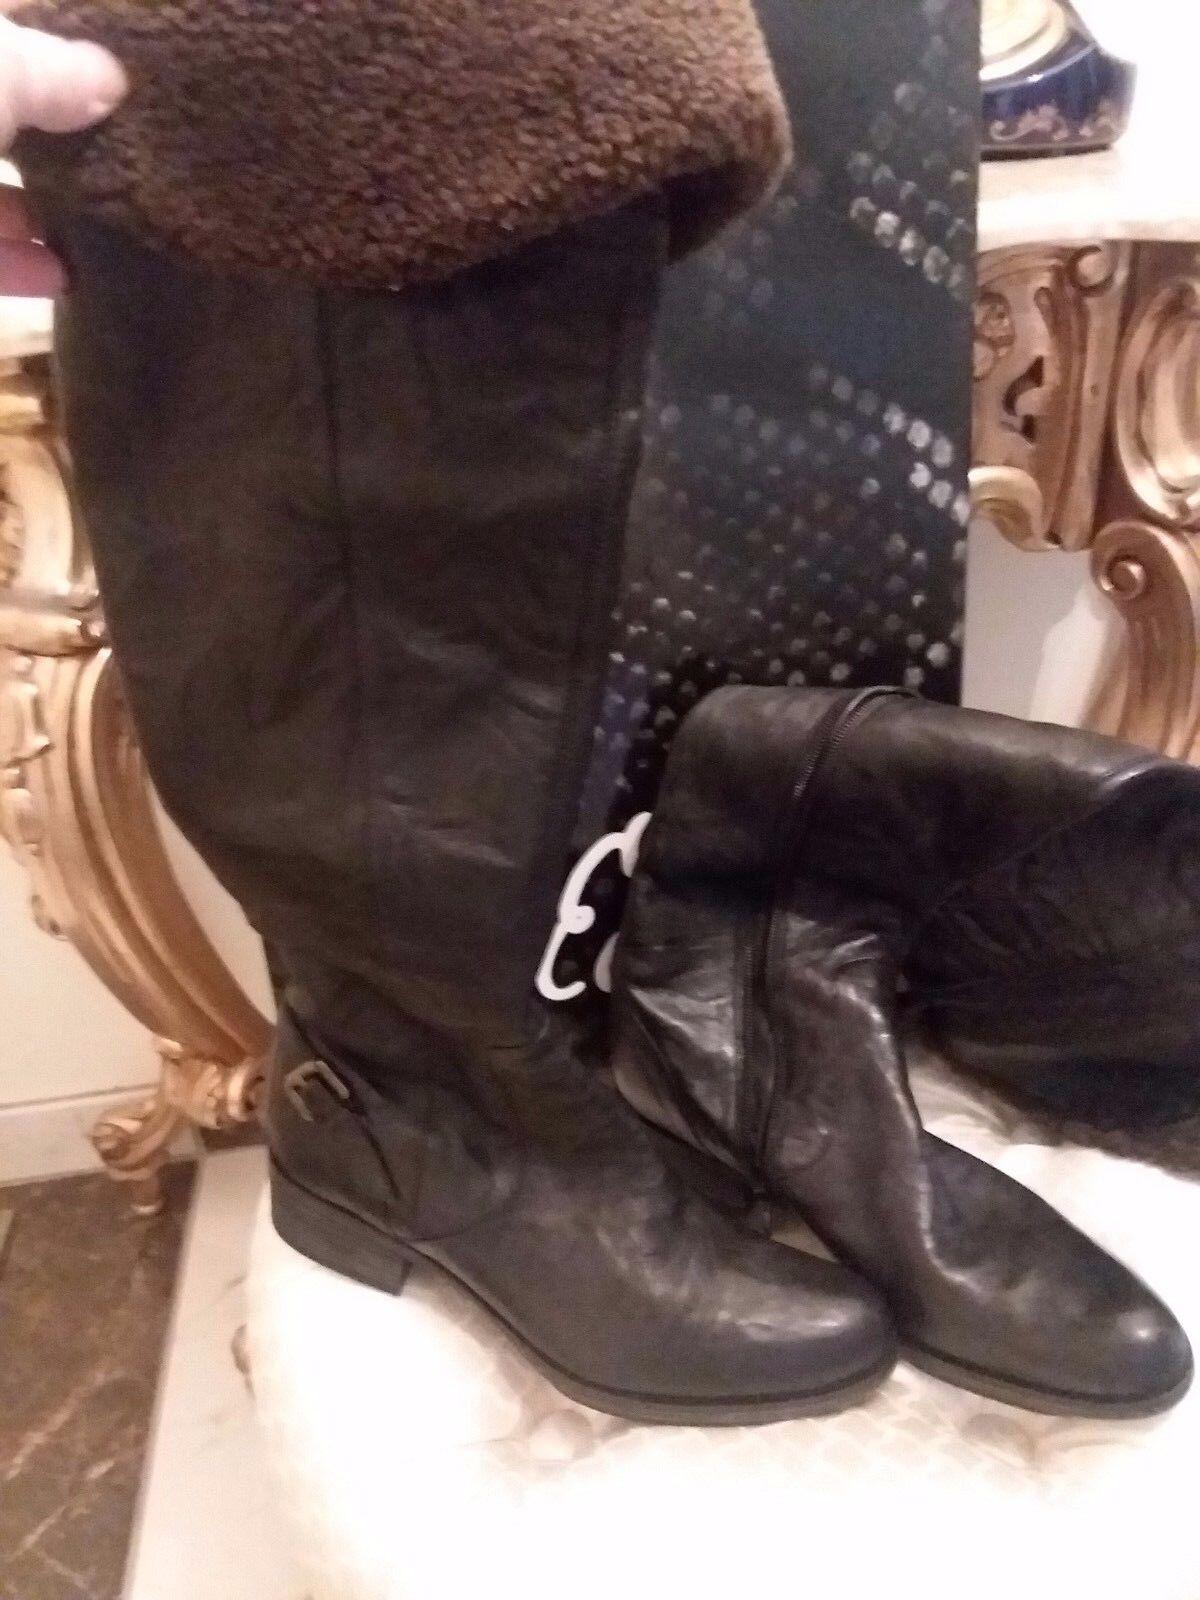 NEU Beautiful Sam Edelman Leder/Shearling Over The Knee Stiefel 7 M